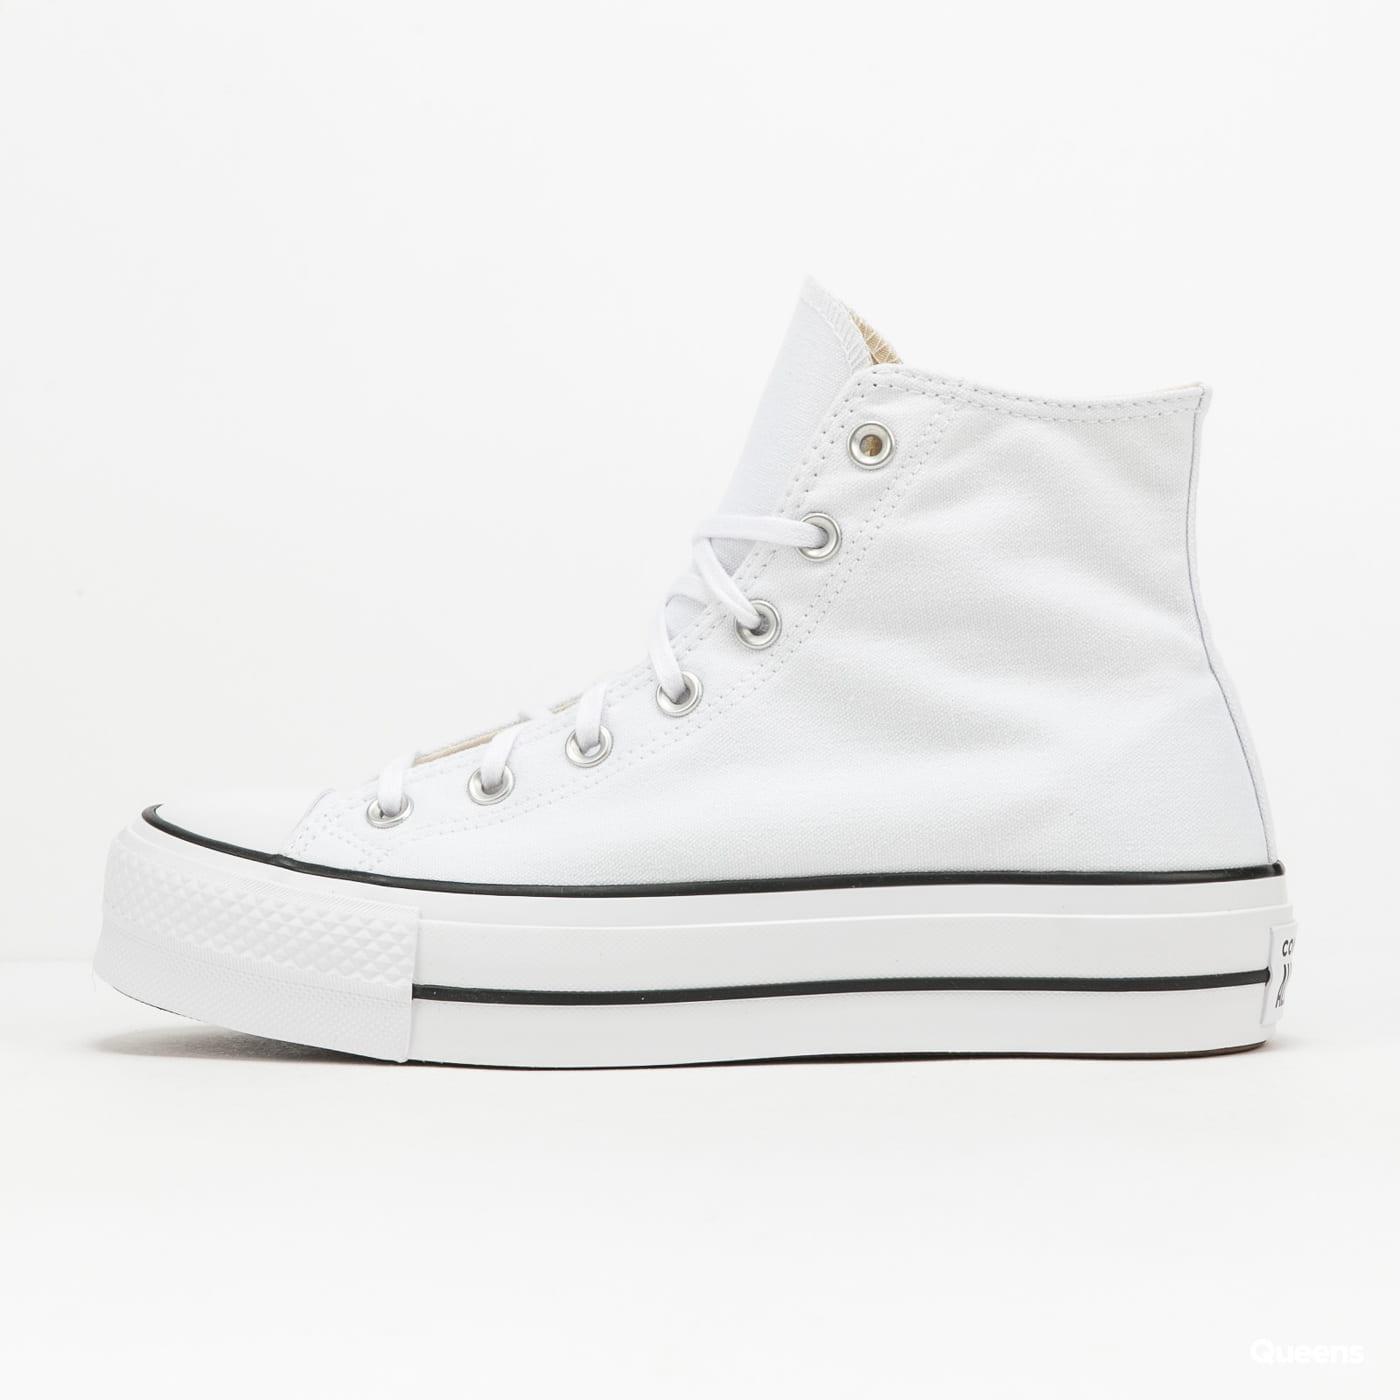 Converse Chuck Taylor All Star Lift Hi white / black / white